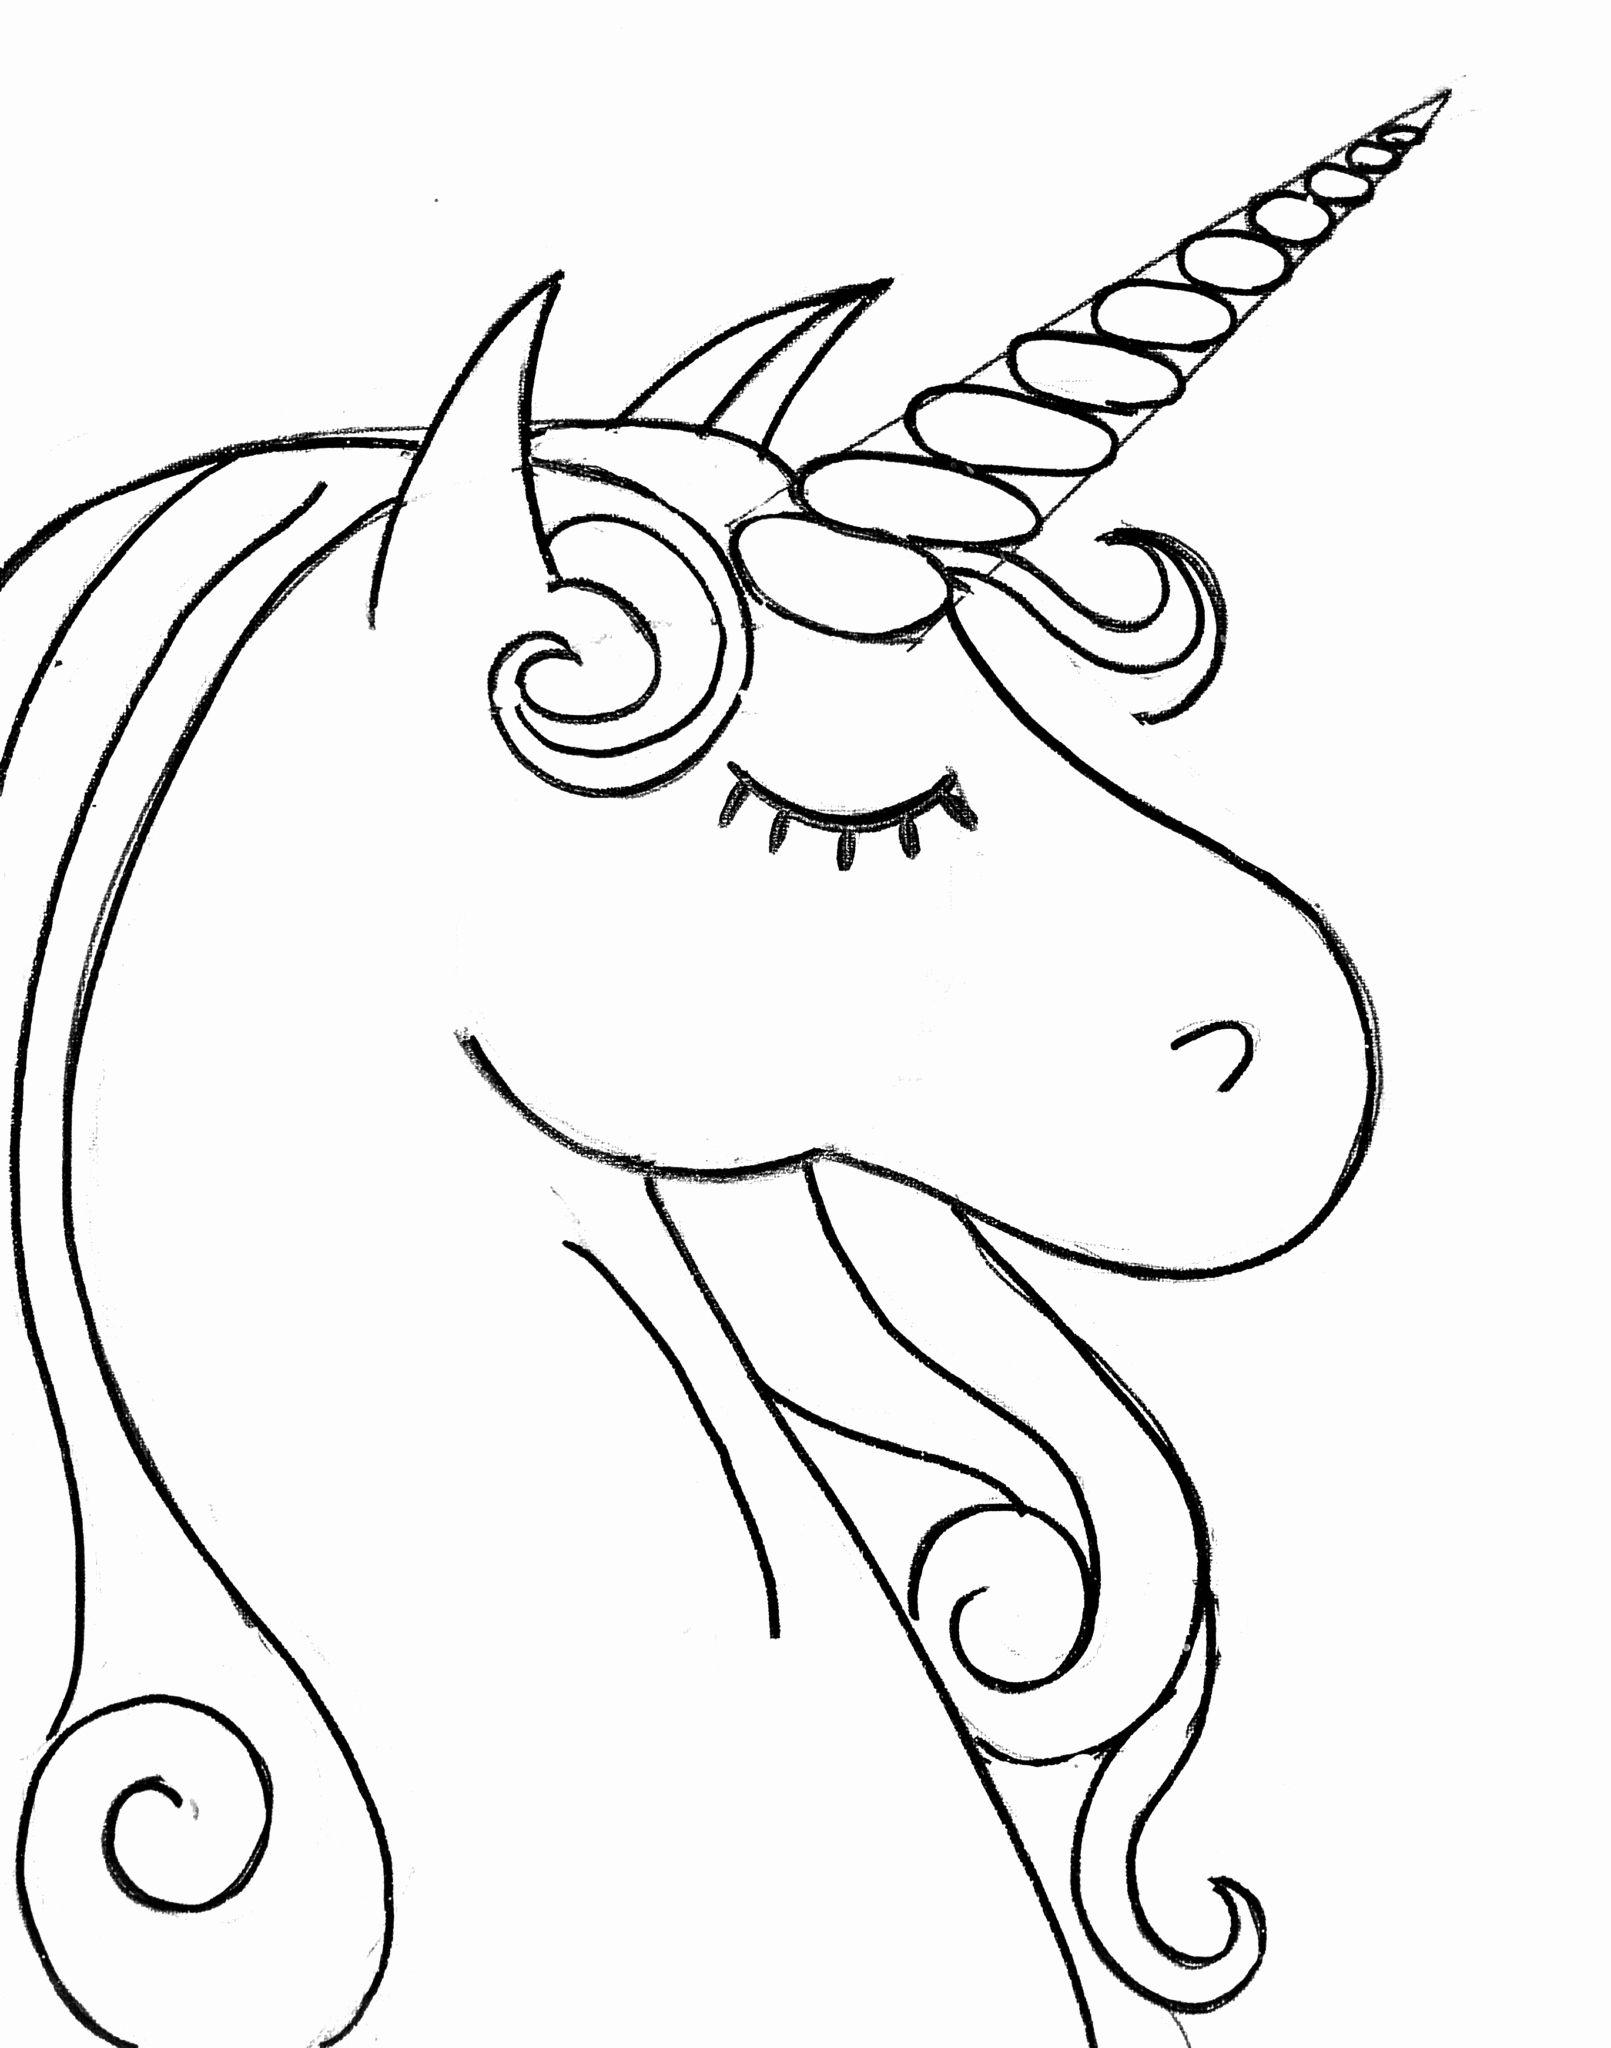 Pin By Erica Brown On Silhueta Unicorn Painting Unicorn Drawing Unicorn Sketch